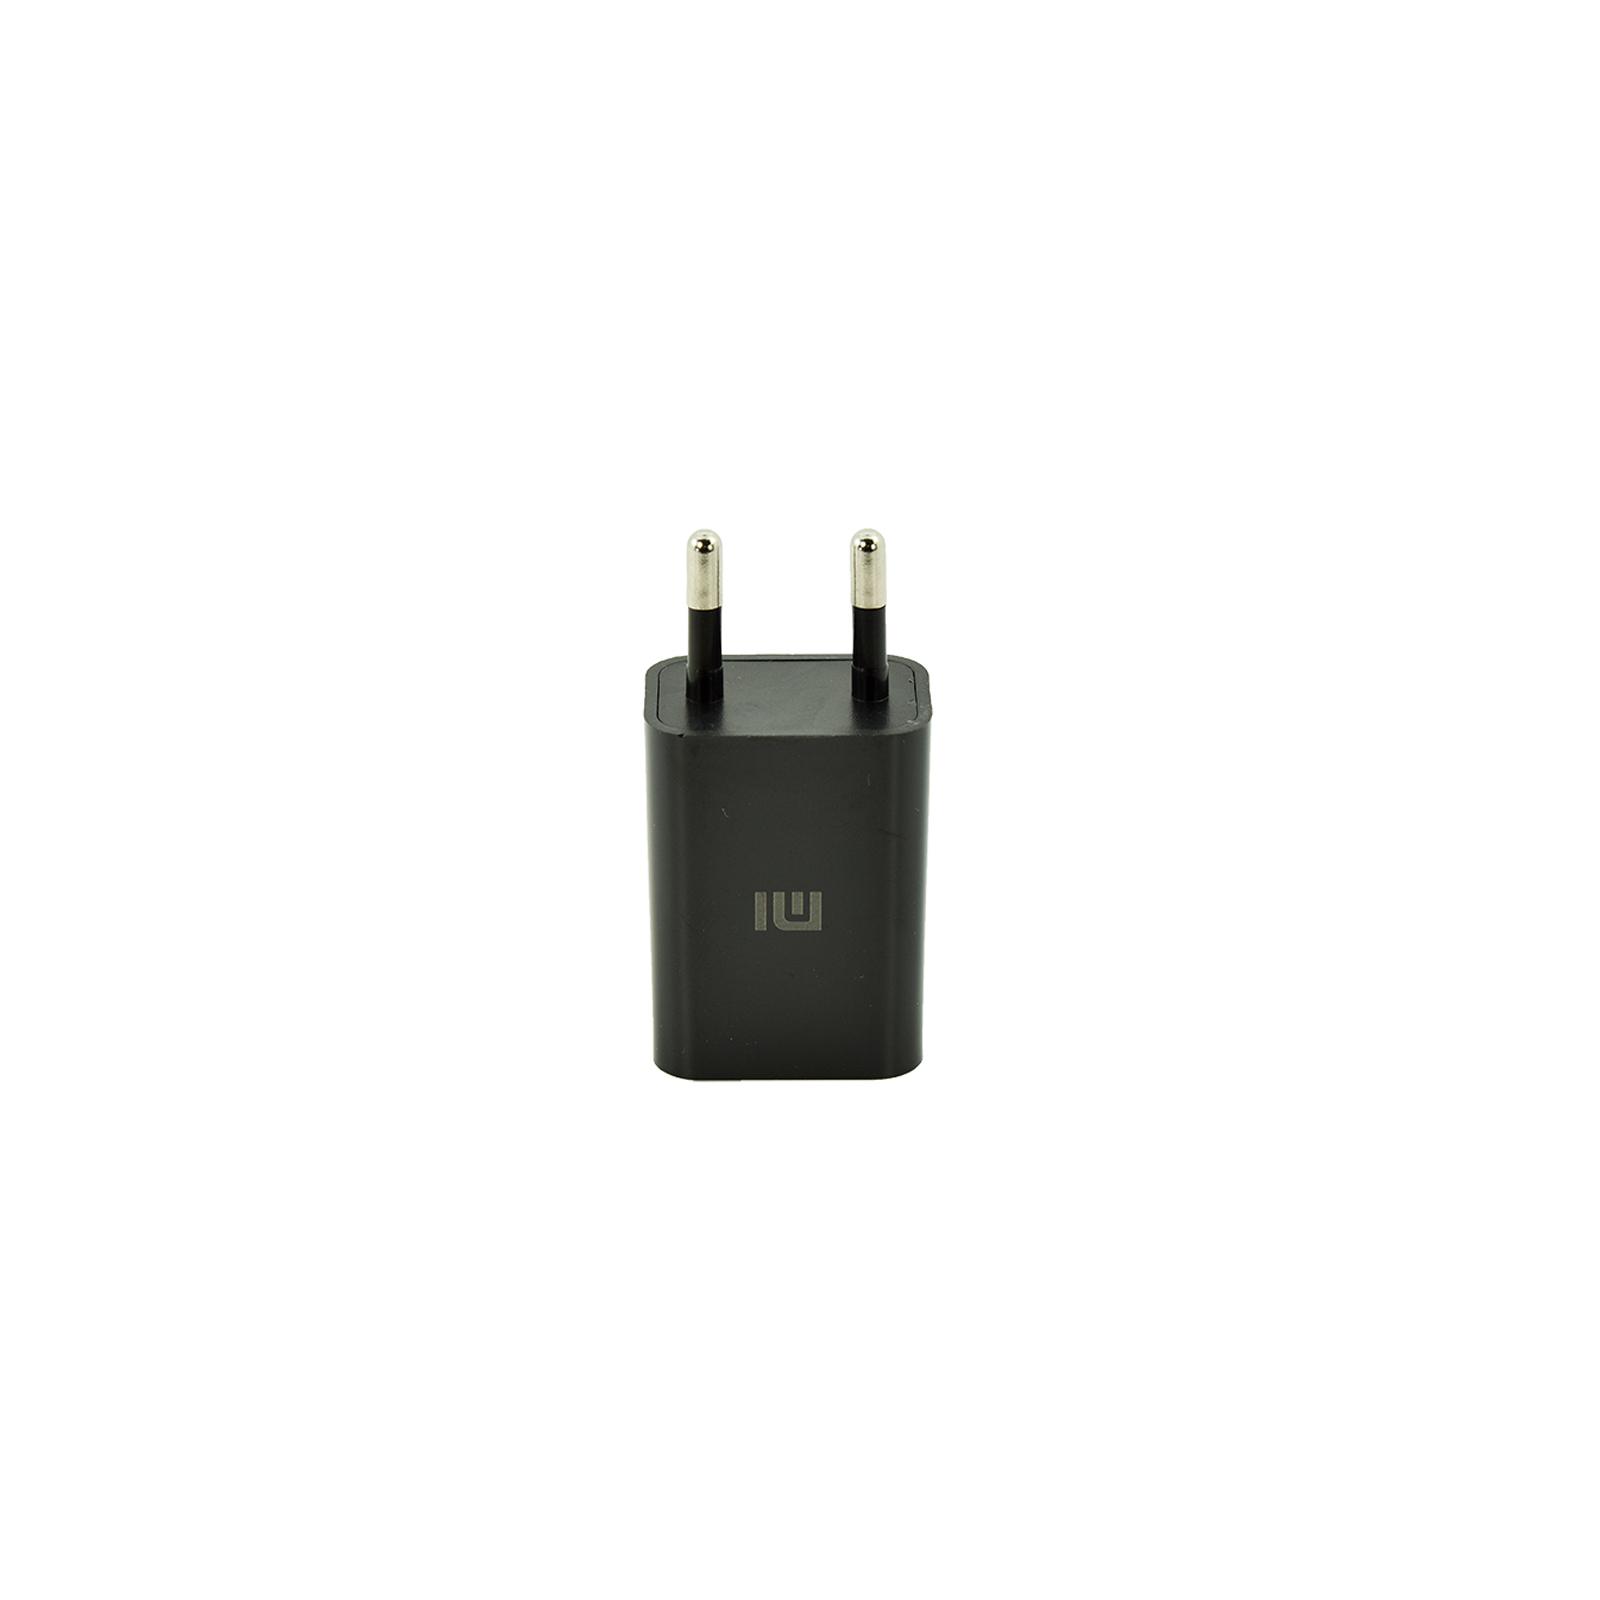 Зарядное устройство Xiaomi CH-P002 1A + cable MicroUSB (41985)